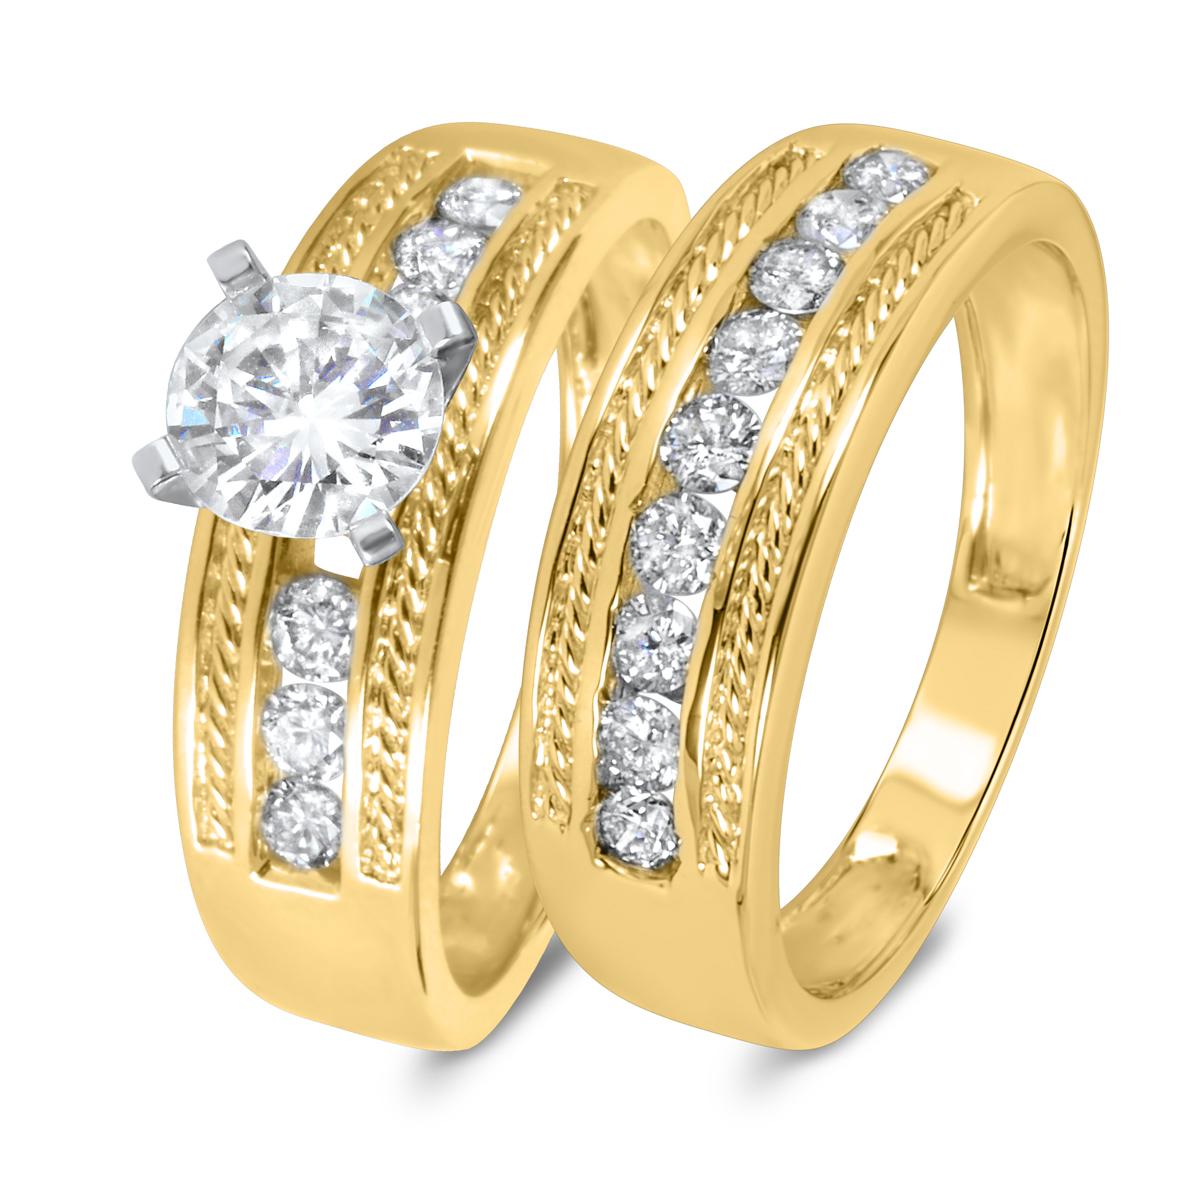 1 3/8 CT. T.W. Diamond Women's Bridal Wedding Ring Set 10K Yellow Gold